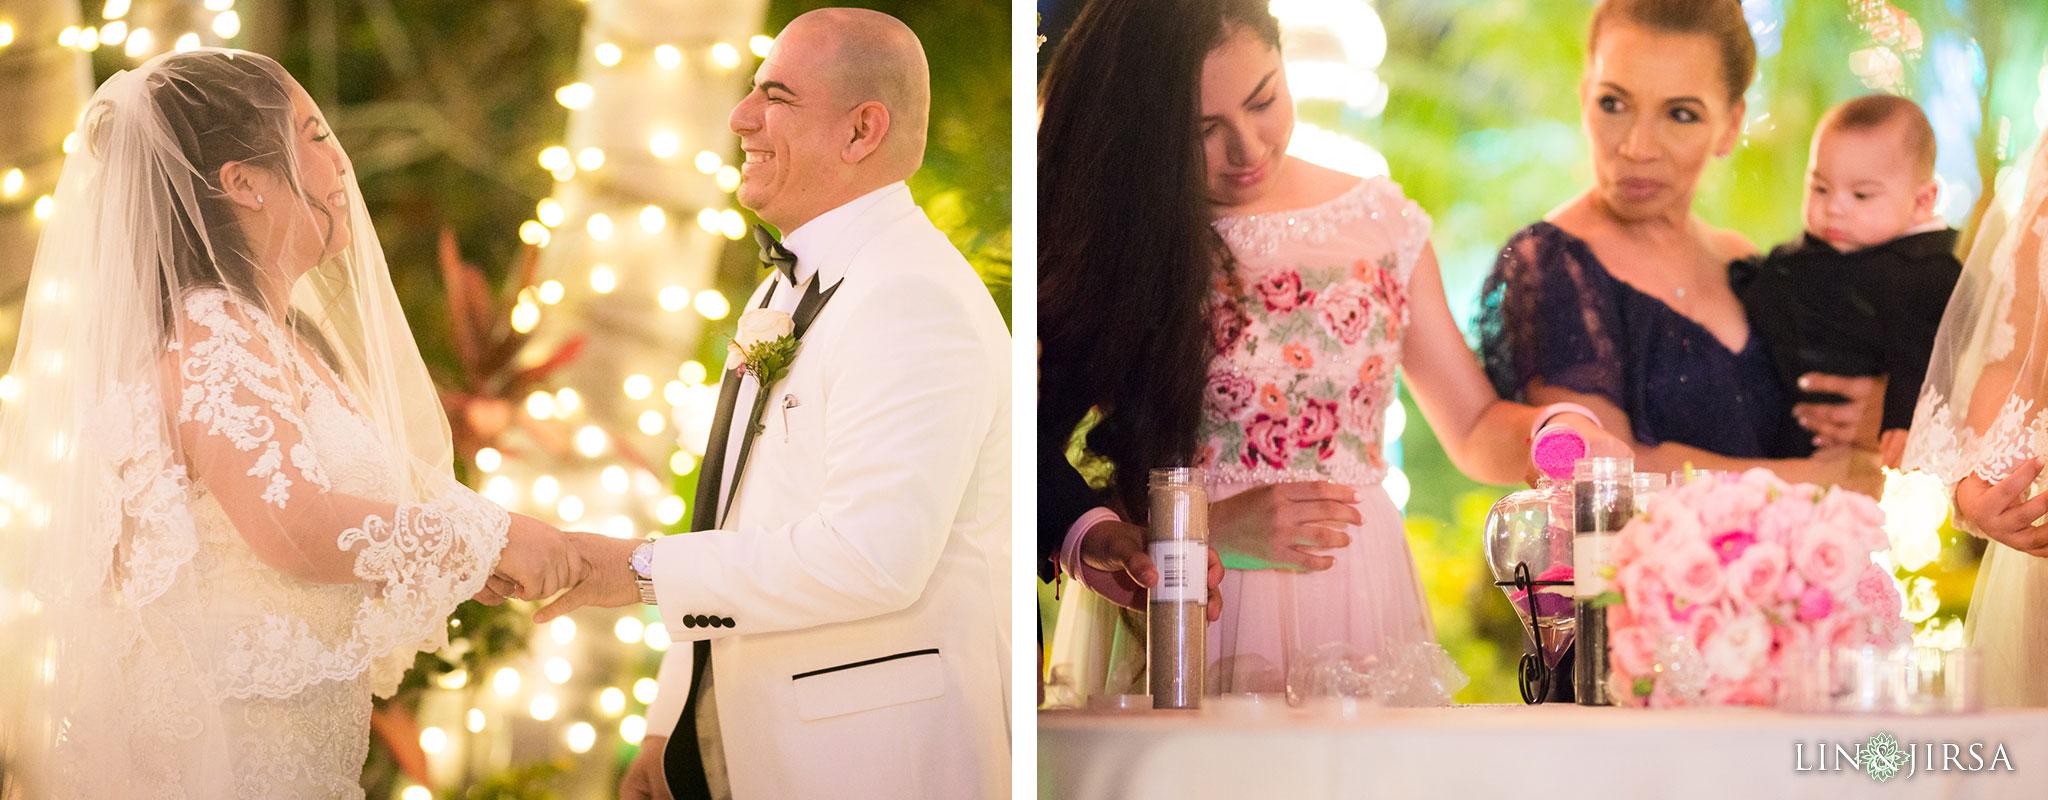 14 taglyan complex los angeles wedding photography